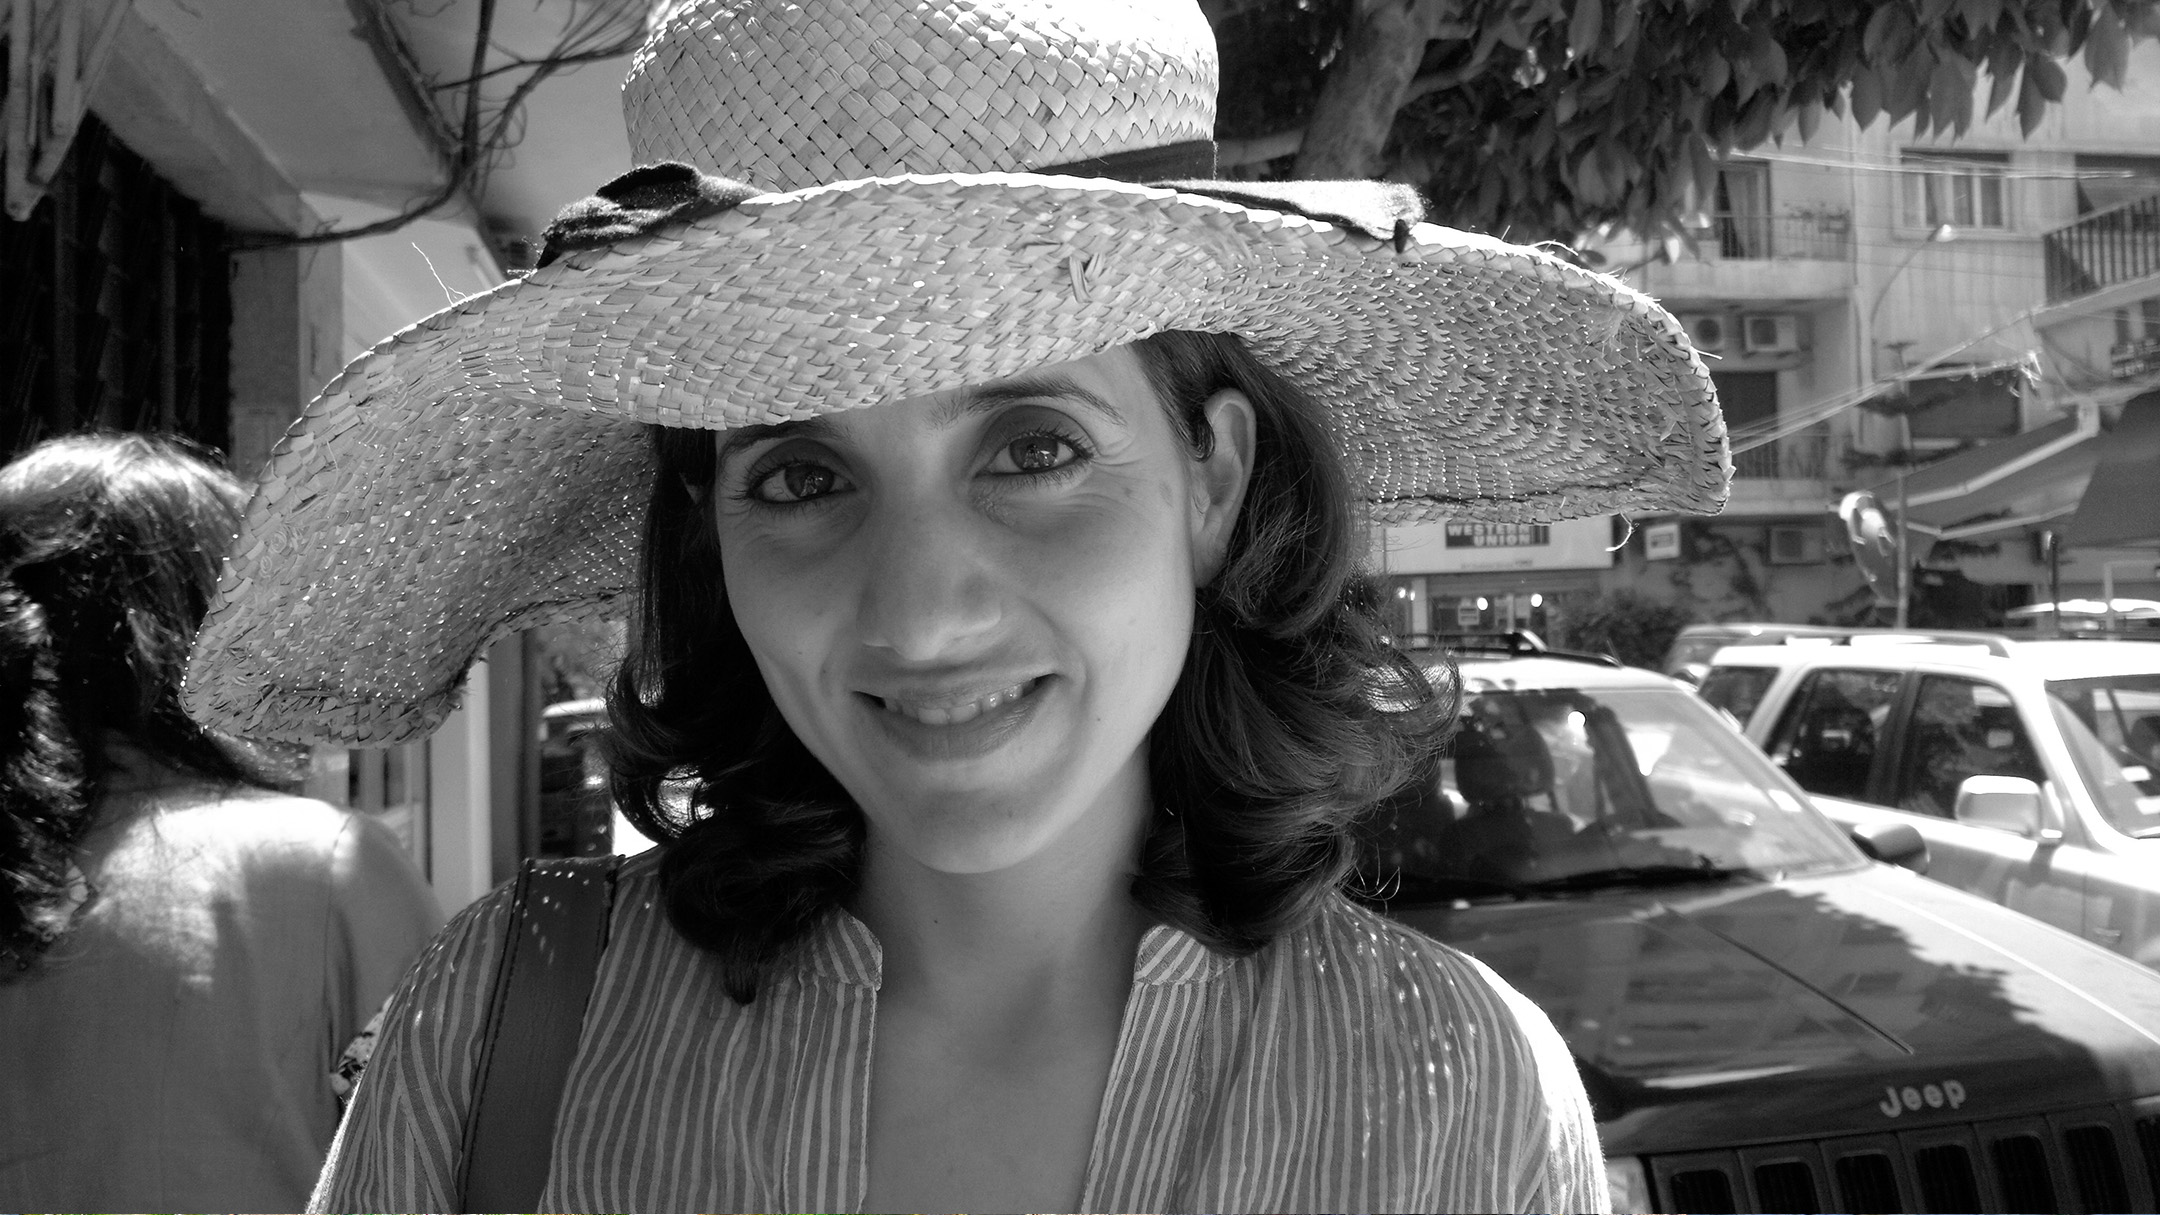 Elyssa Skaff, L'Hôte Libanais